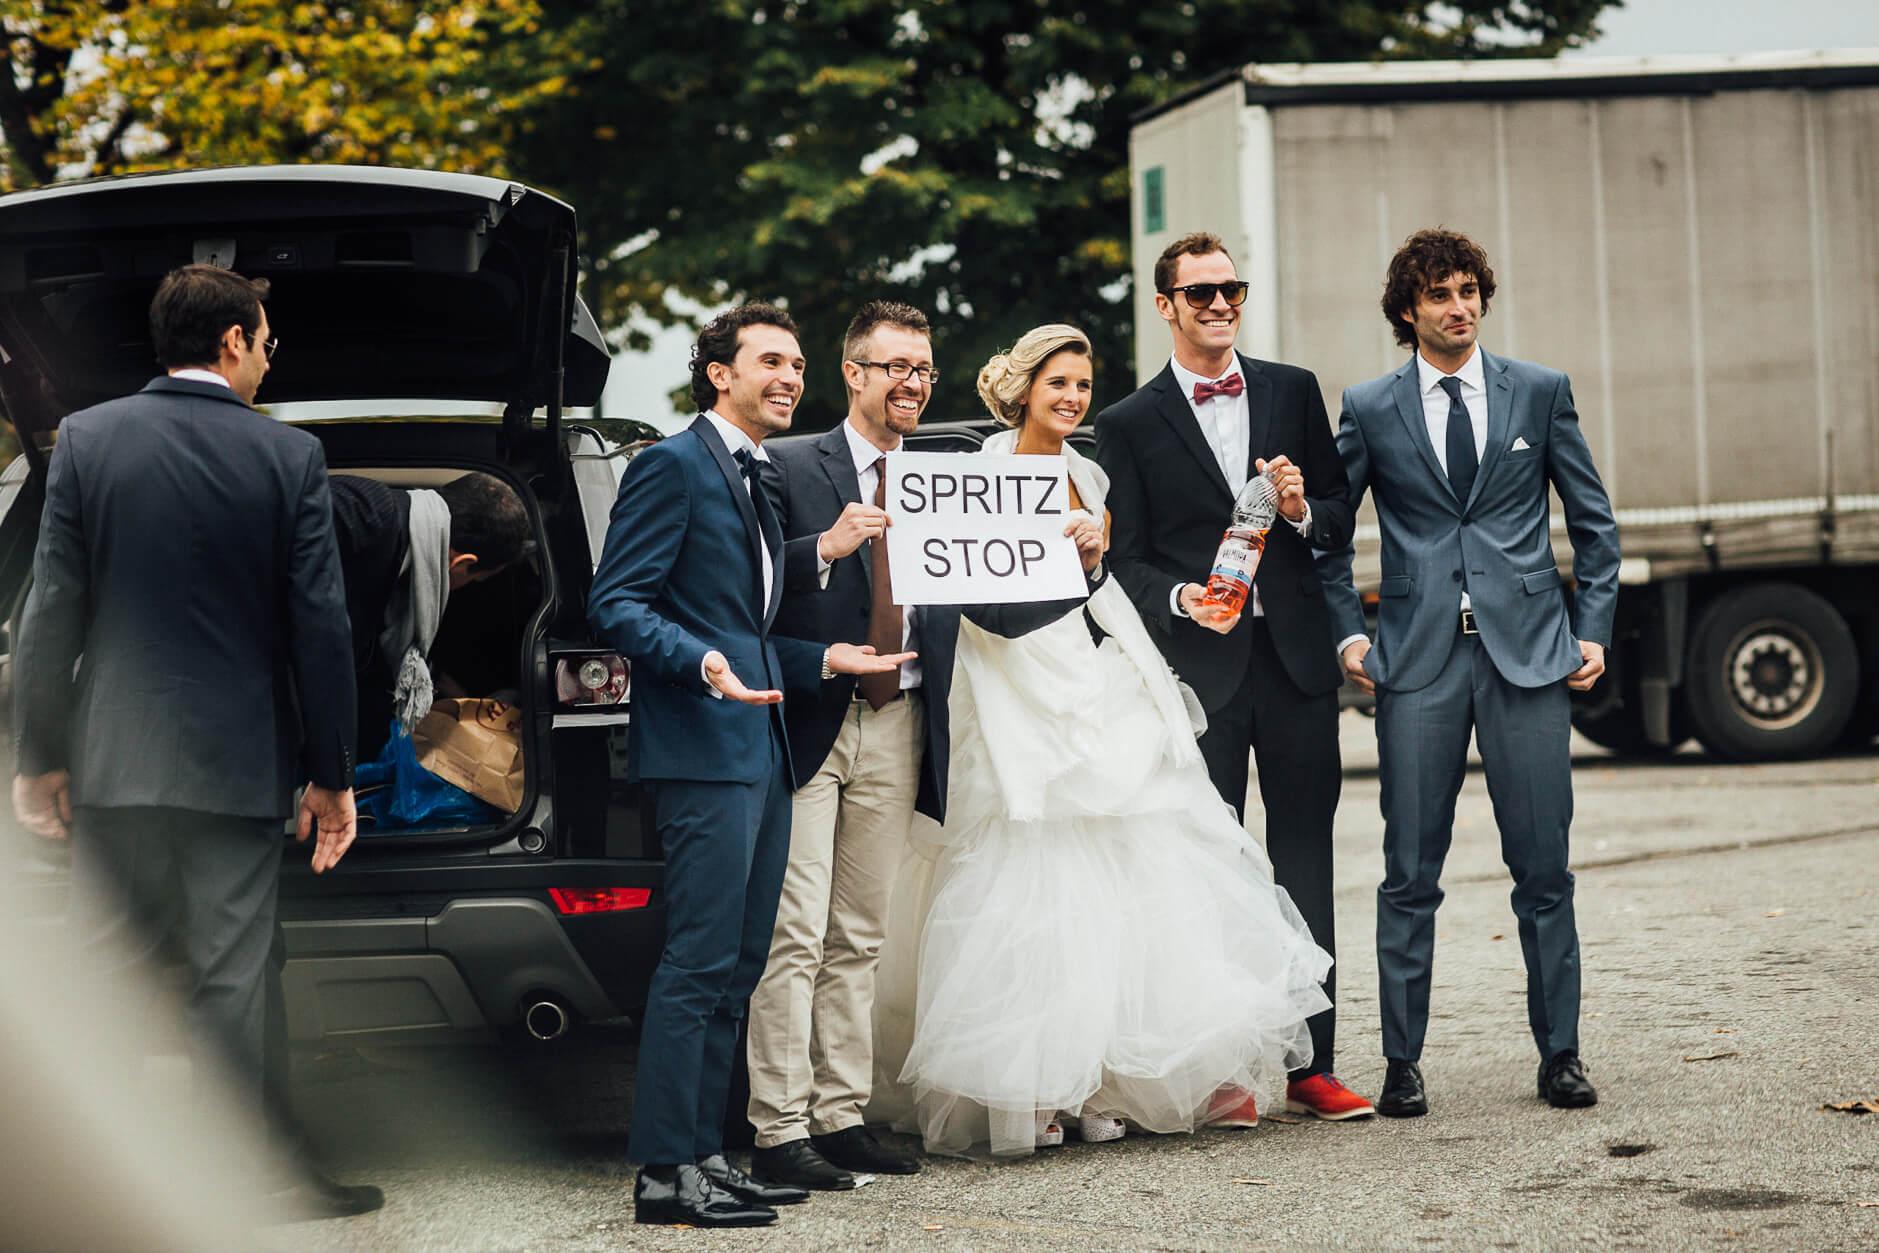 scherzi matrimonio spritz stop